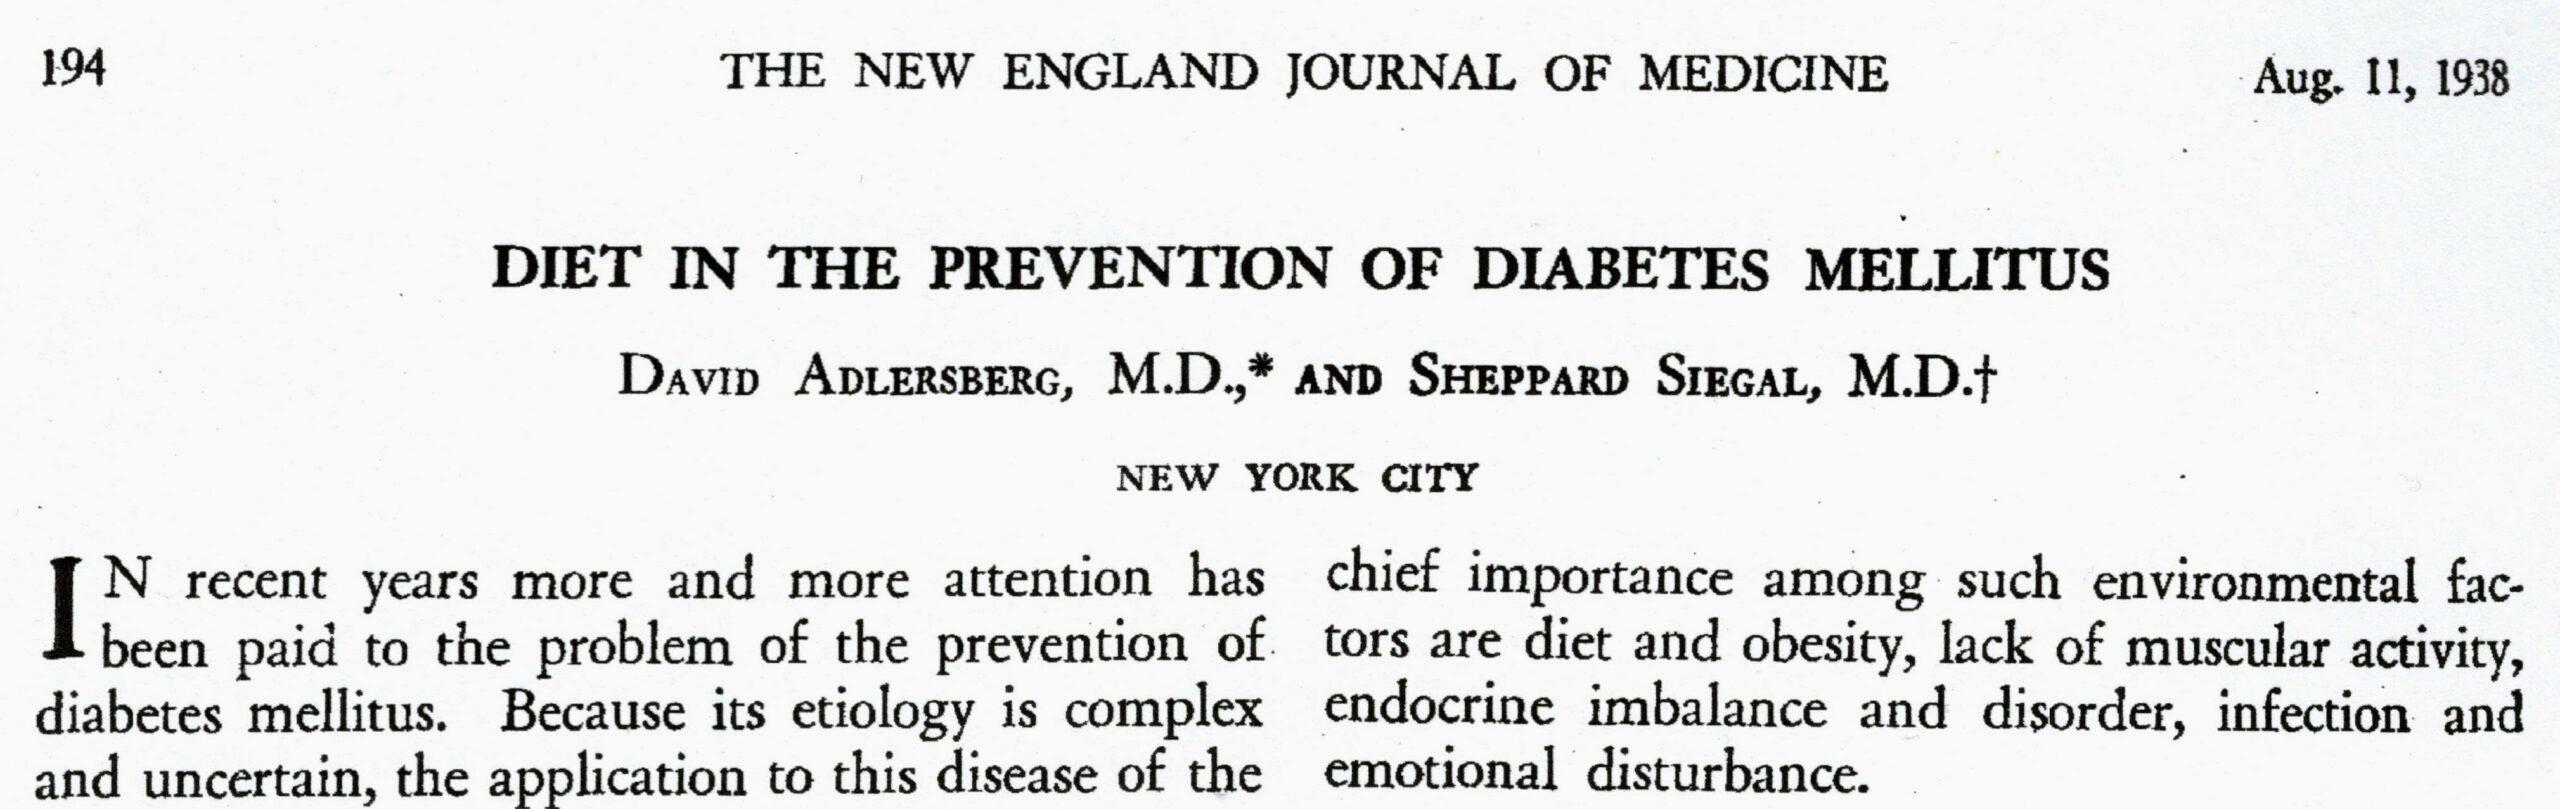 New England Journal of Medicine 1938